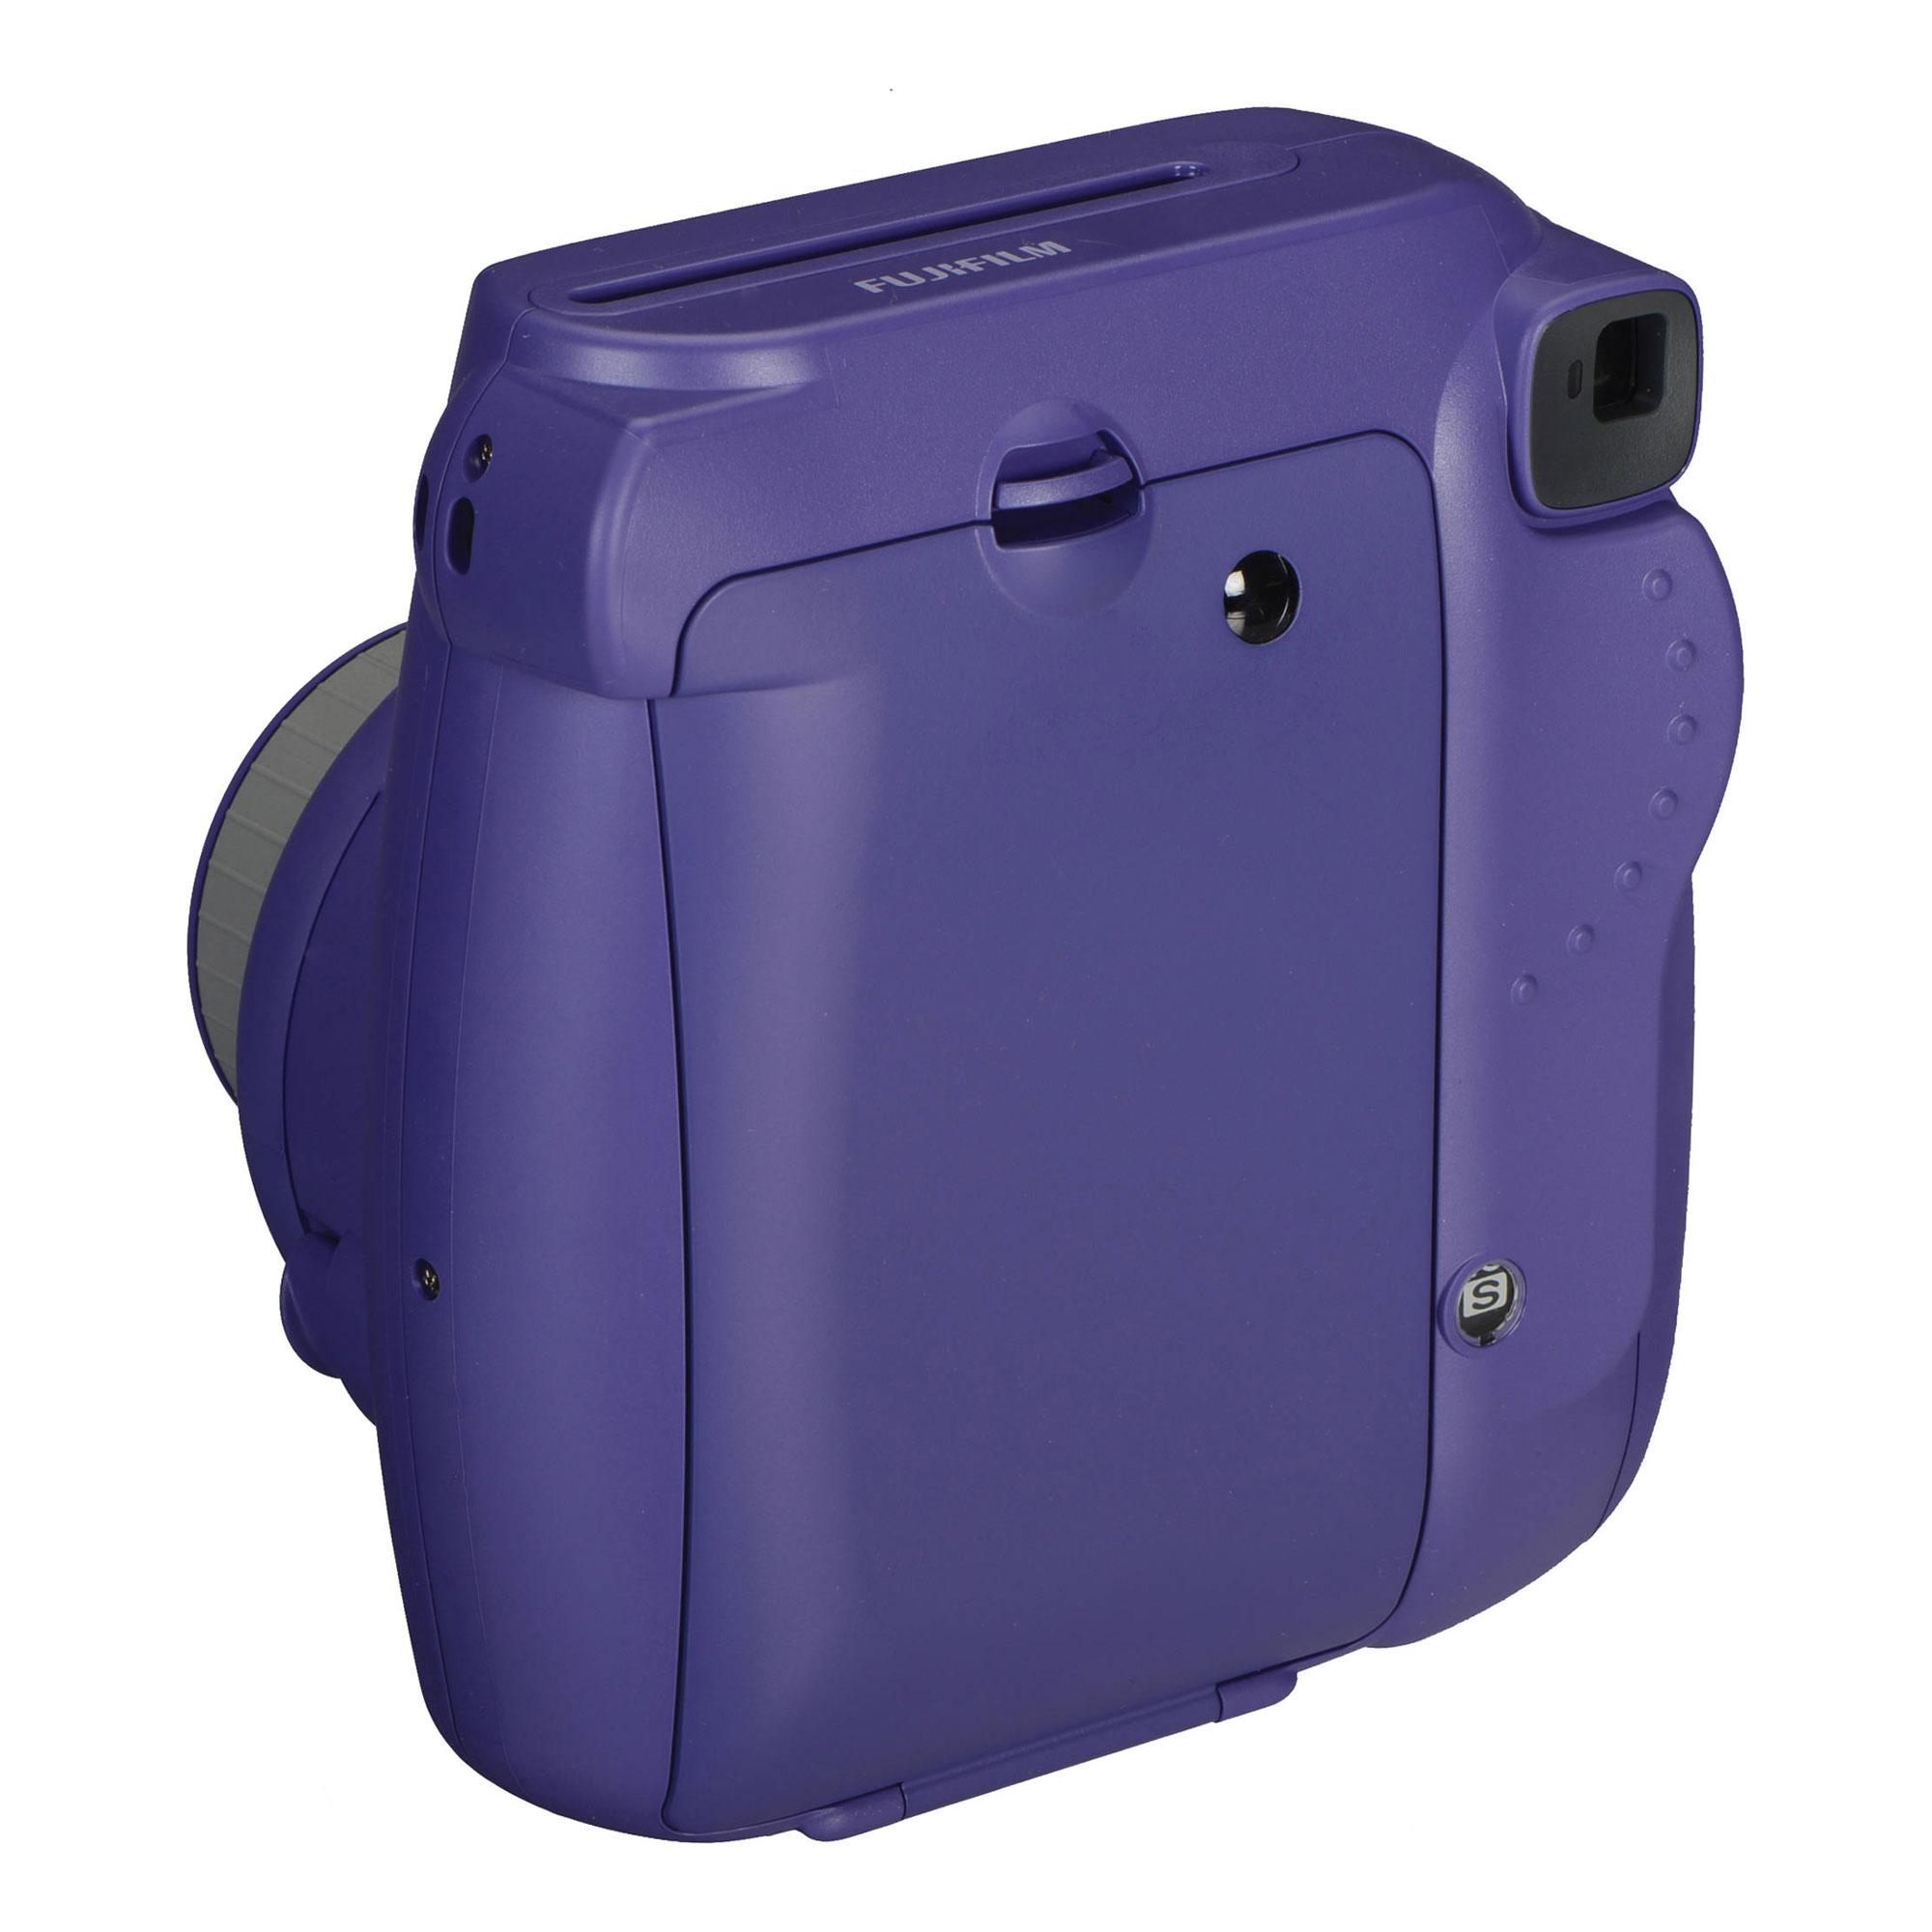 Instax Mini 8 Instant Film Camera Grape